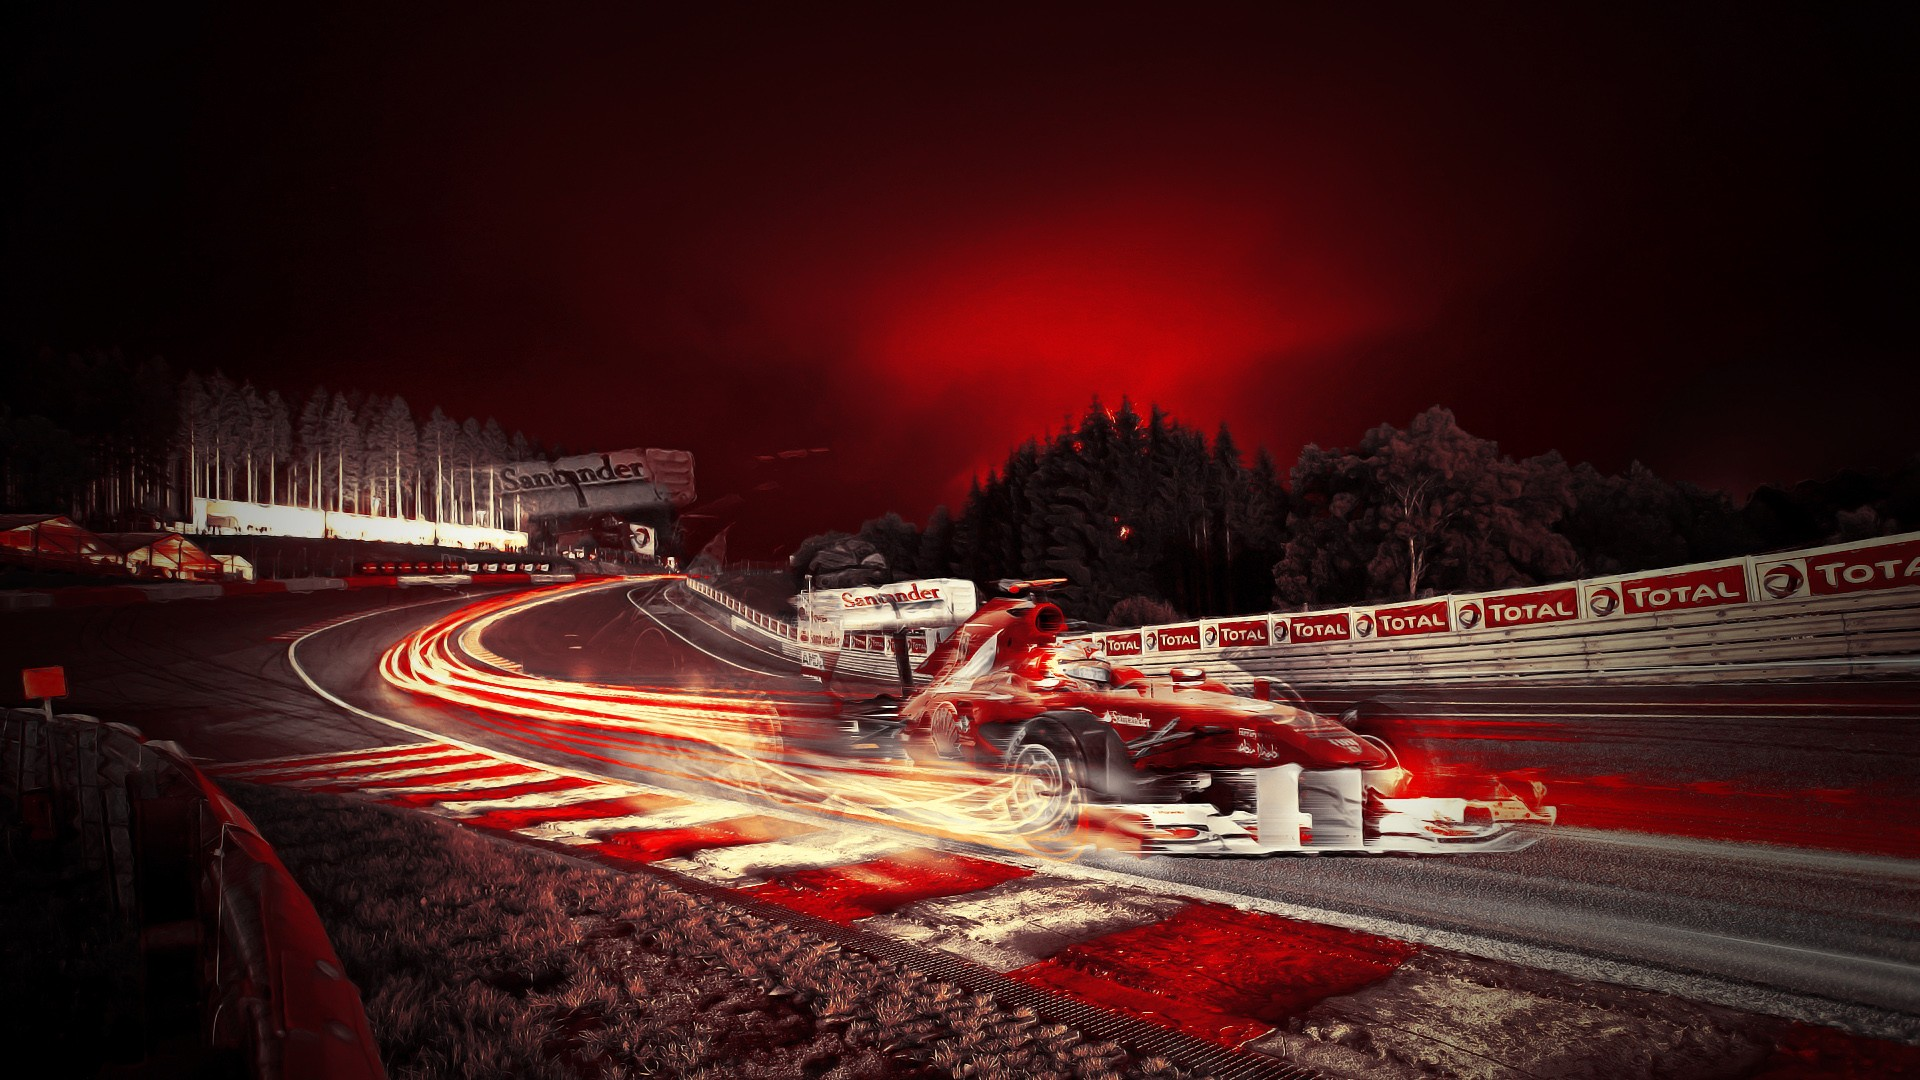 F1 Cars Wallpapers Desktop F1 Race Wallpapers Hd Wallpapers Id 16734